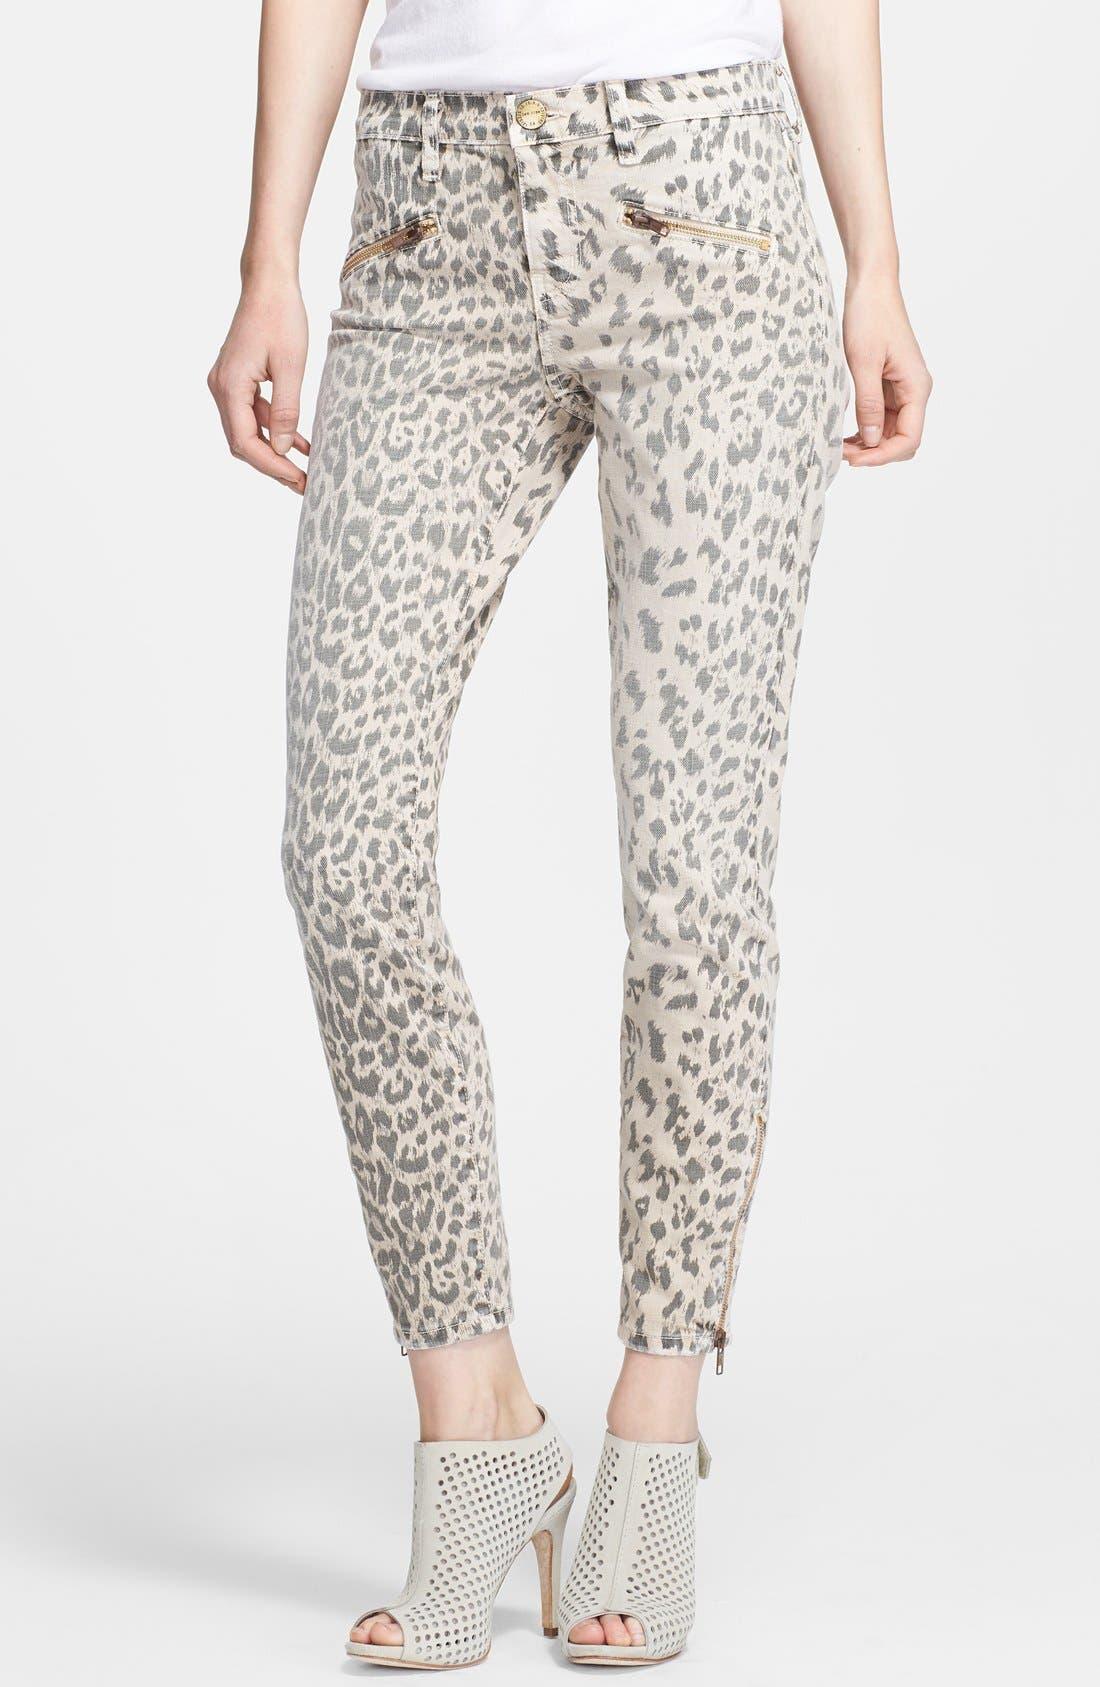 Alternate Image 1 Selected - Current/Elliott 'The Soho' Leopard Print Zip Skinny Jeans (Stone Leopard)